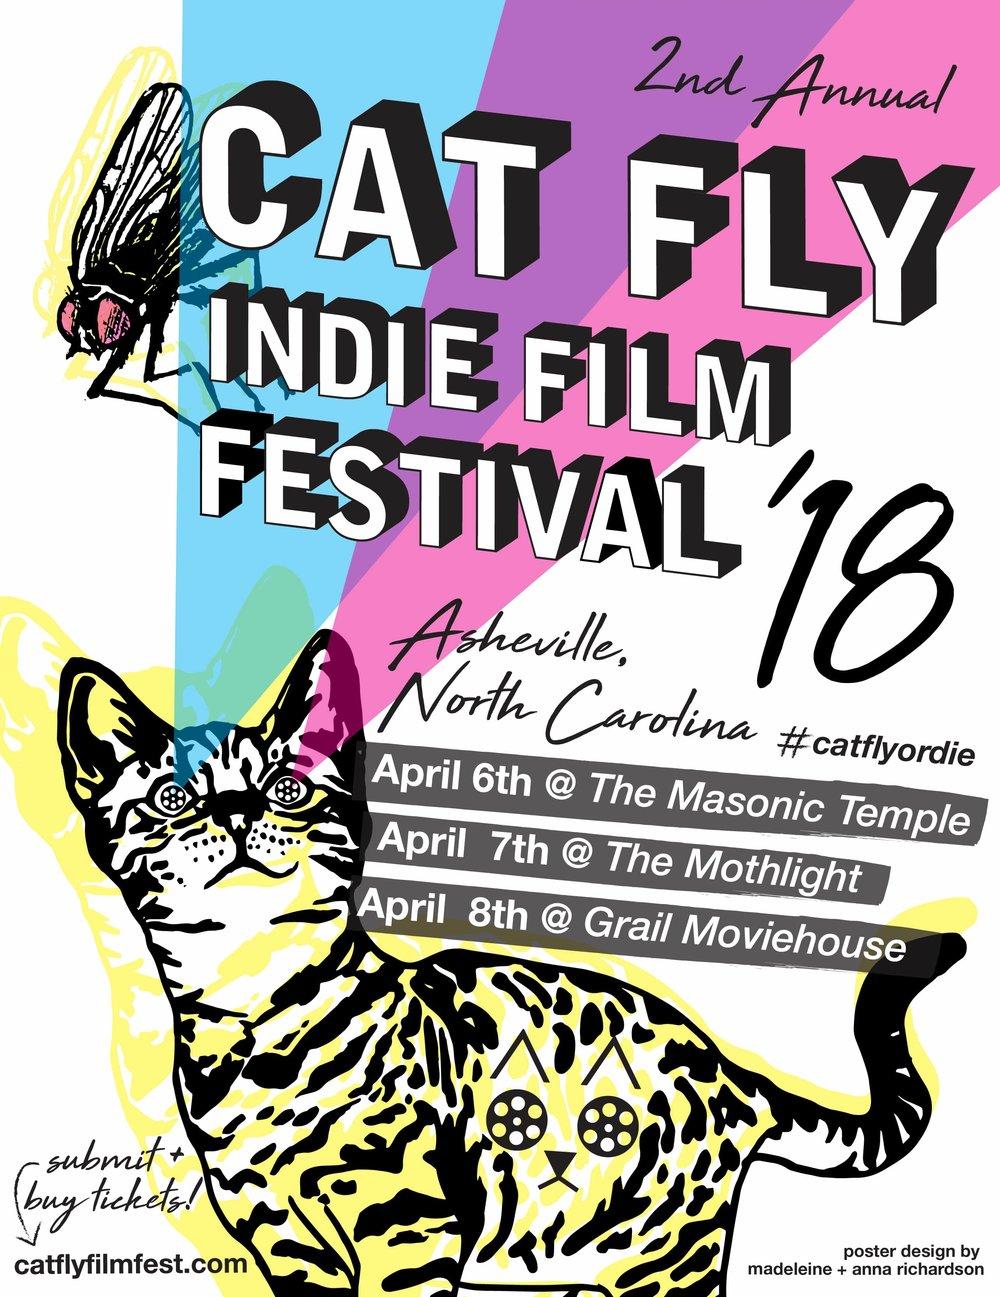 Cat-Fly-Indie-Film-Festival-ConnectBeyondFestival.jpg